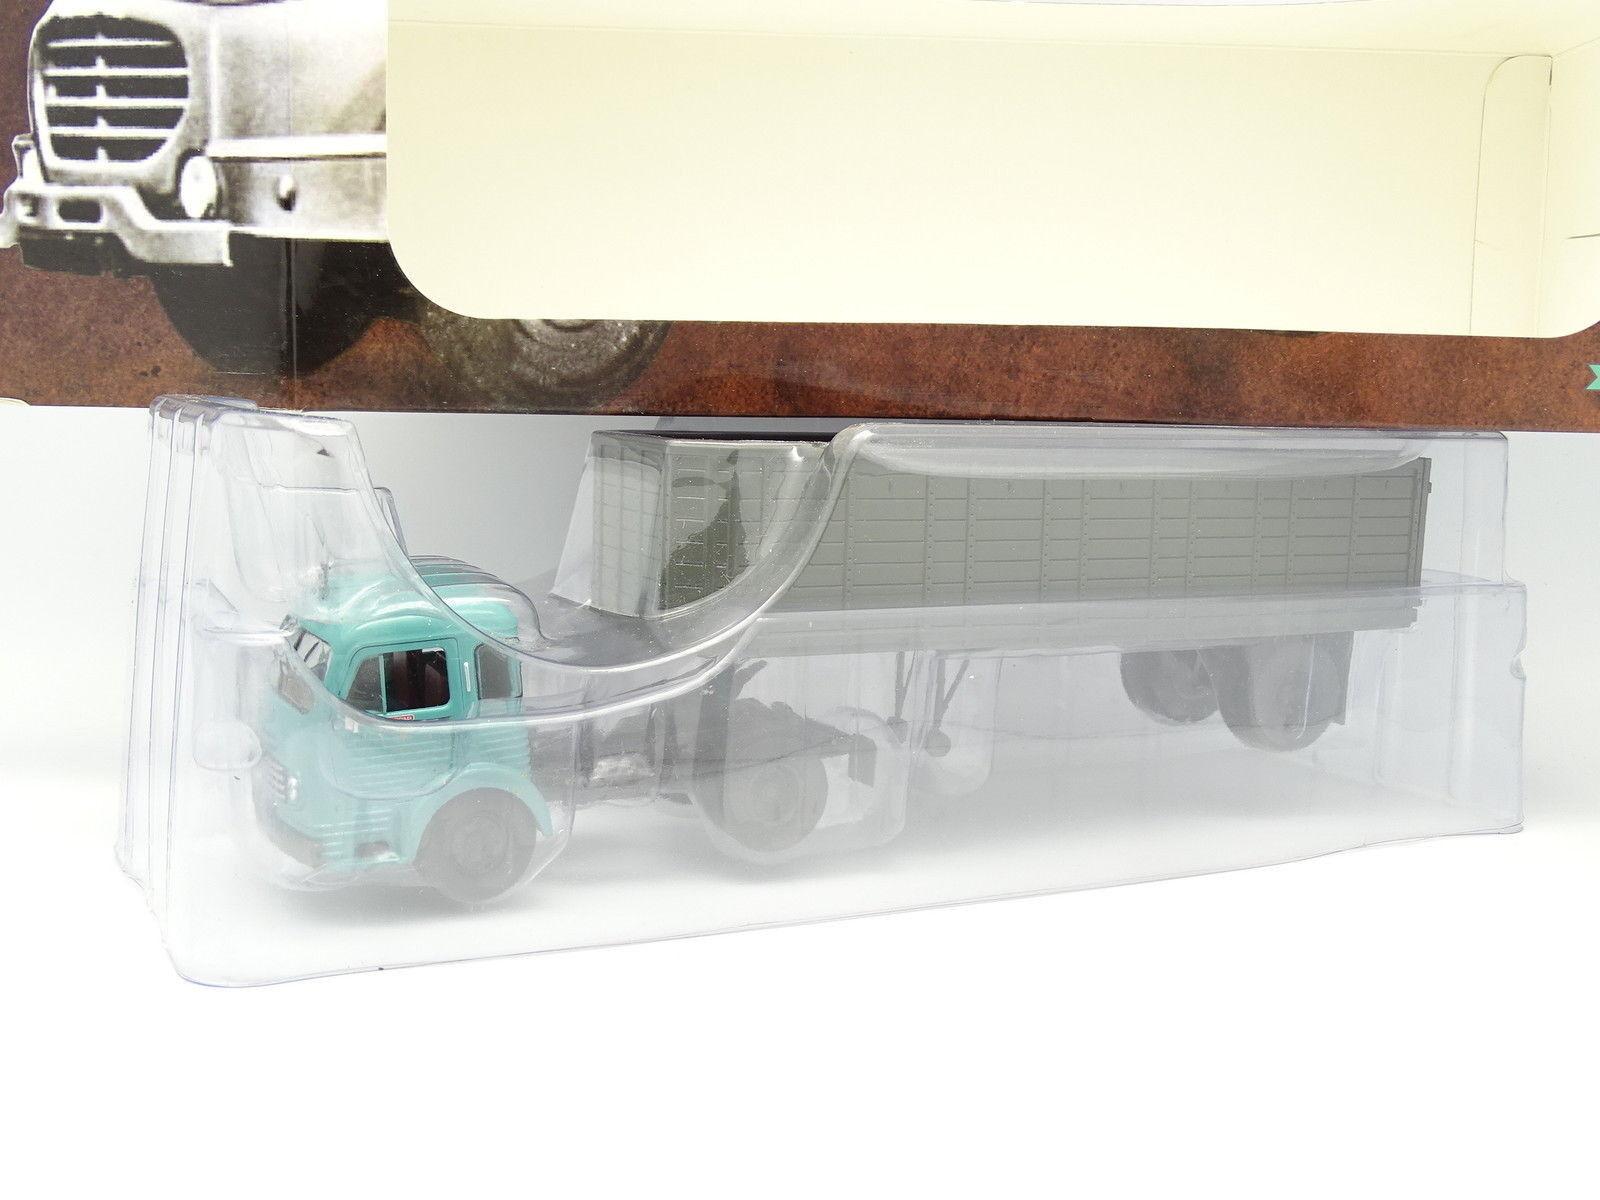 Ixo Camion d'Autrefois 1 43 -  Ford Cargo Remorqueur (1951-1954)